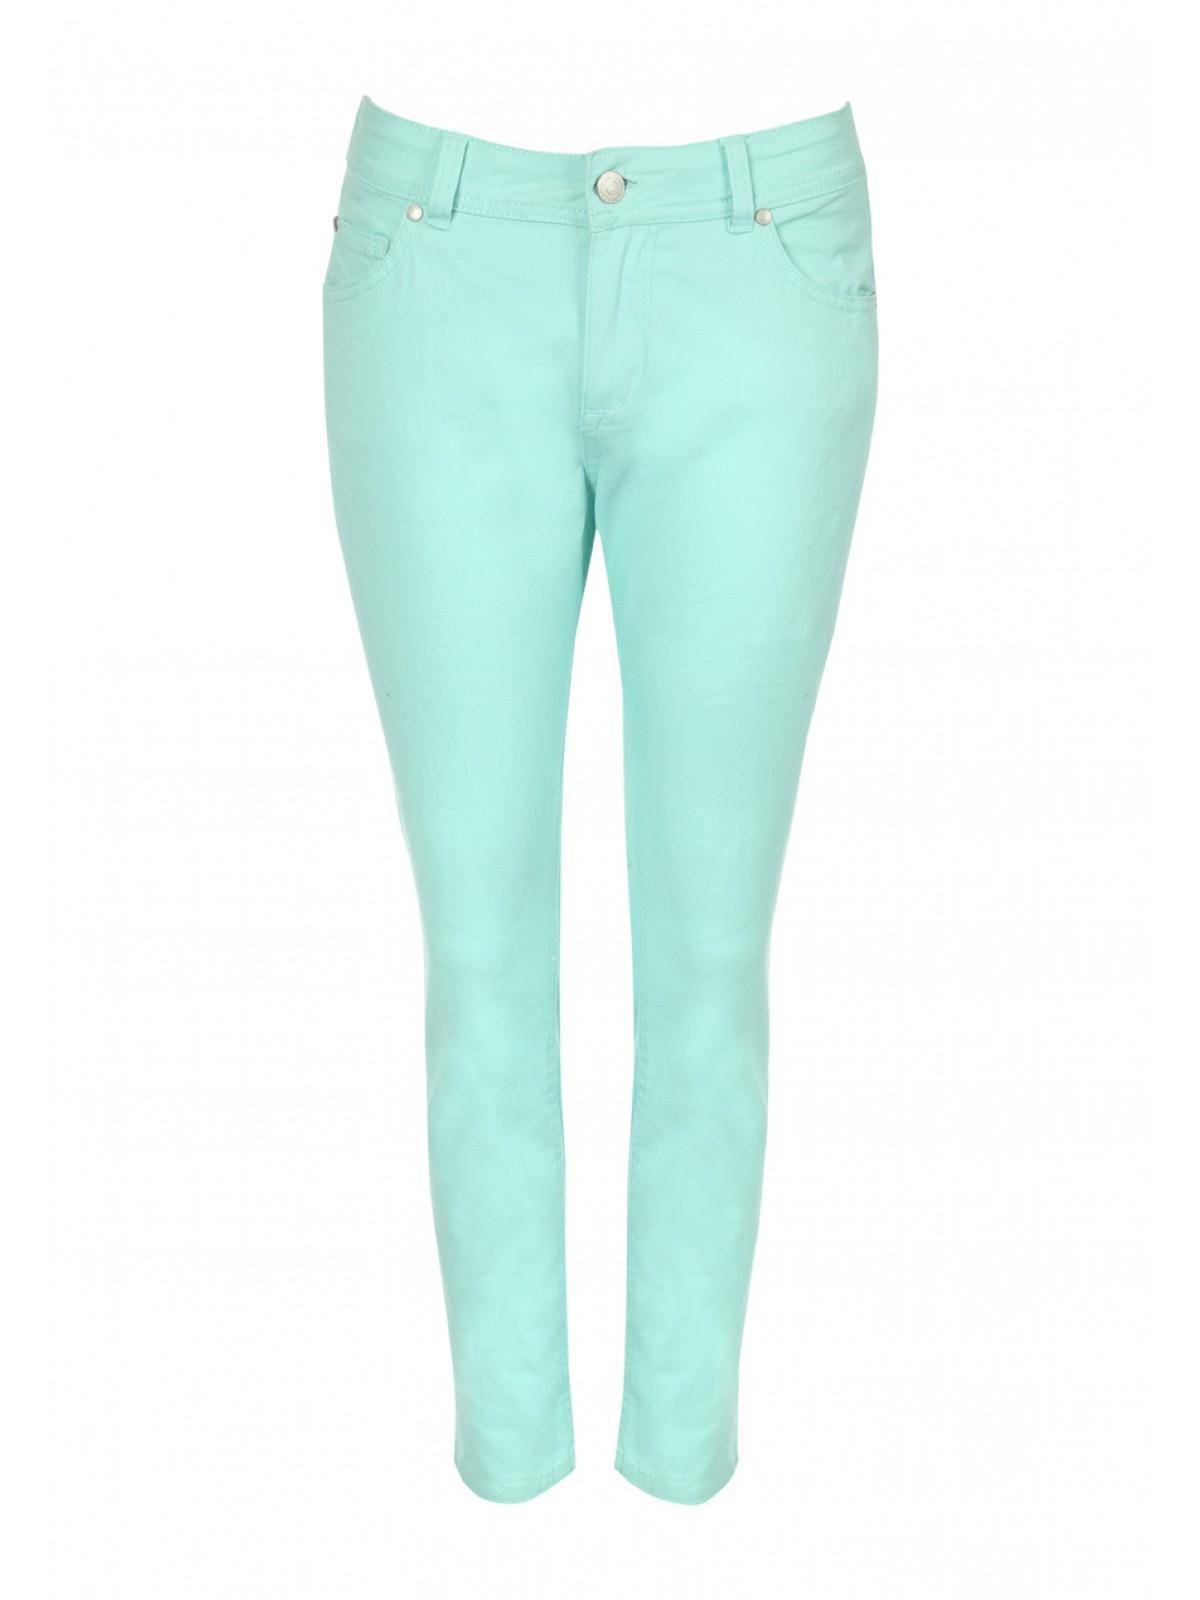 Womens Coloured Slim Jeans | Peacocks